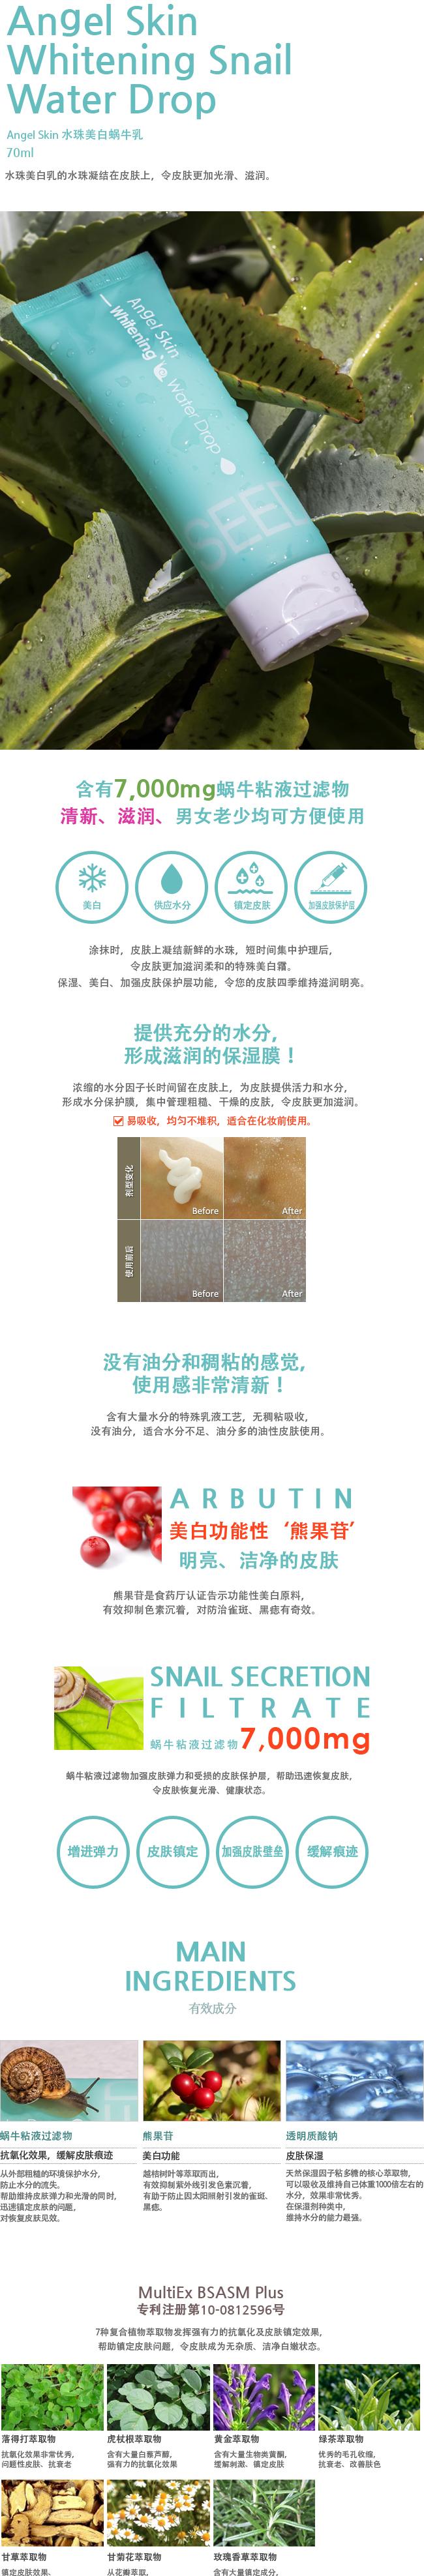 Credit: Seed & Tree China website